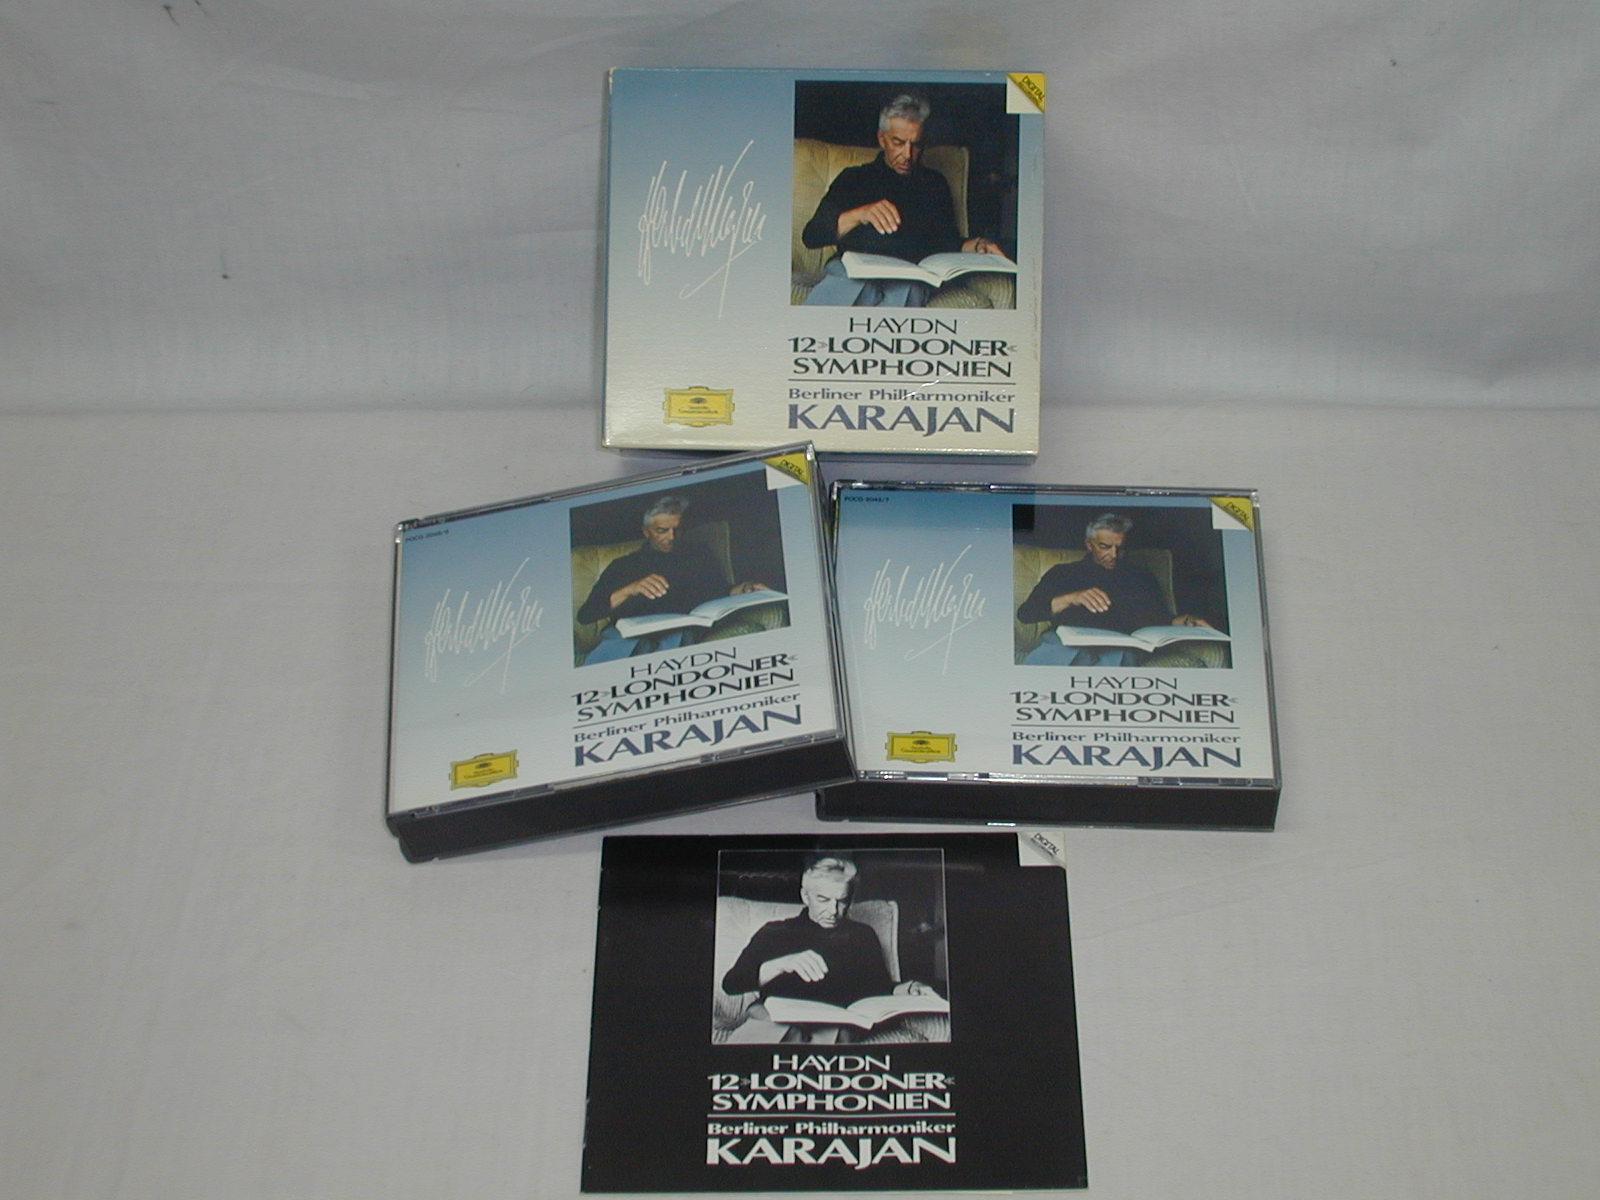 (CD) ハイドン:「ロンドン交響曲」集/カラヤン <5枚組>